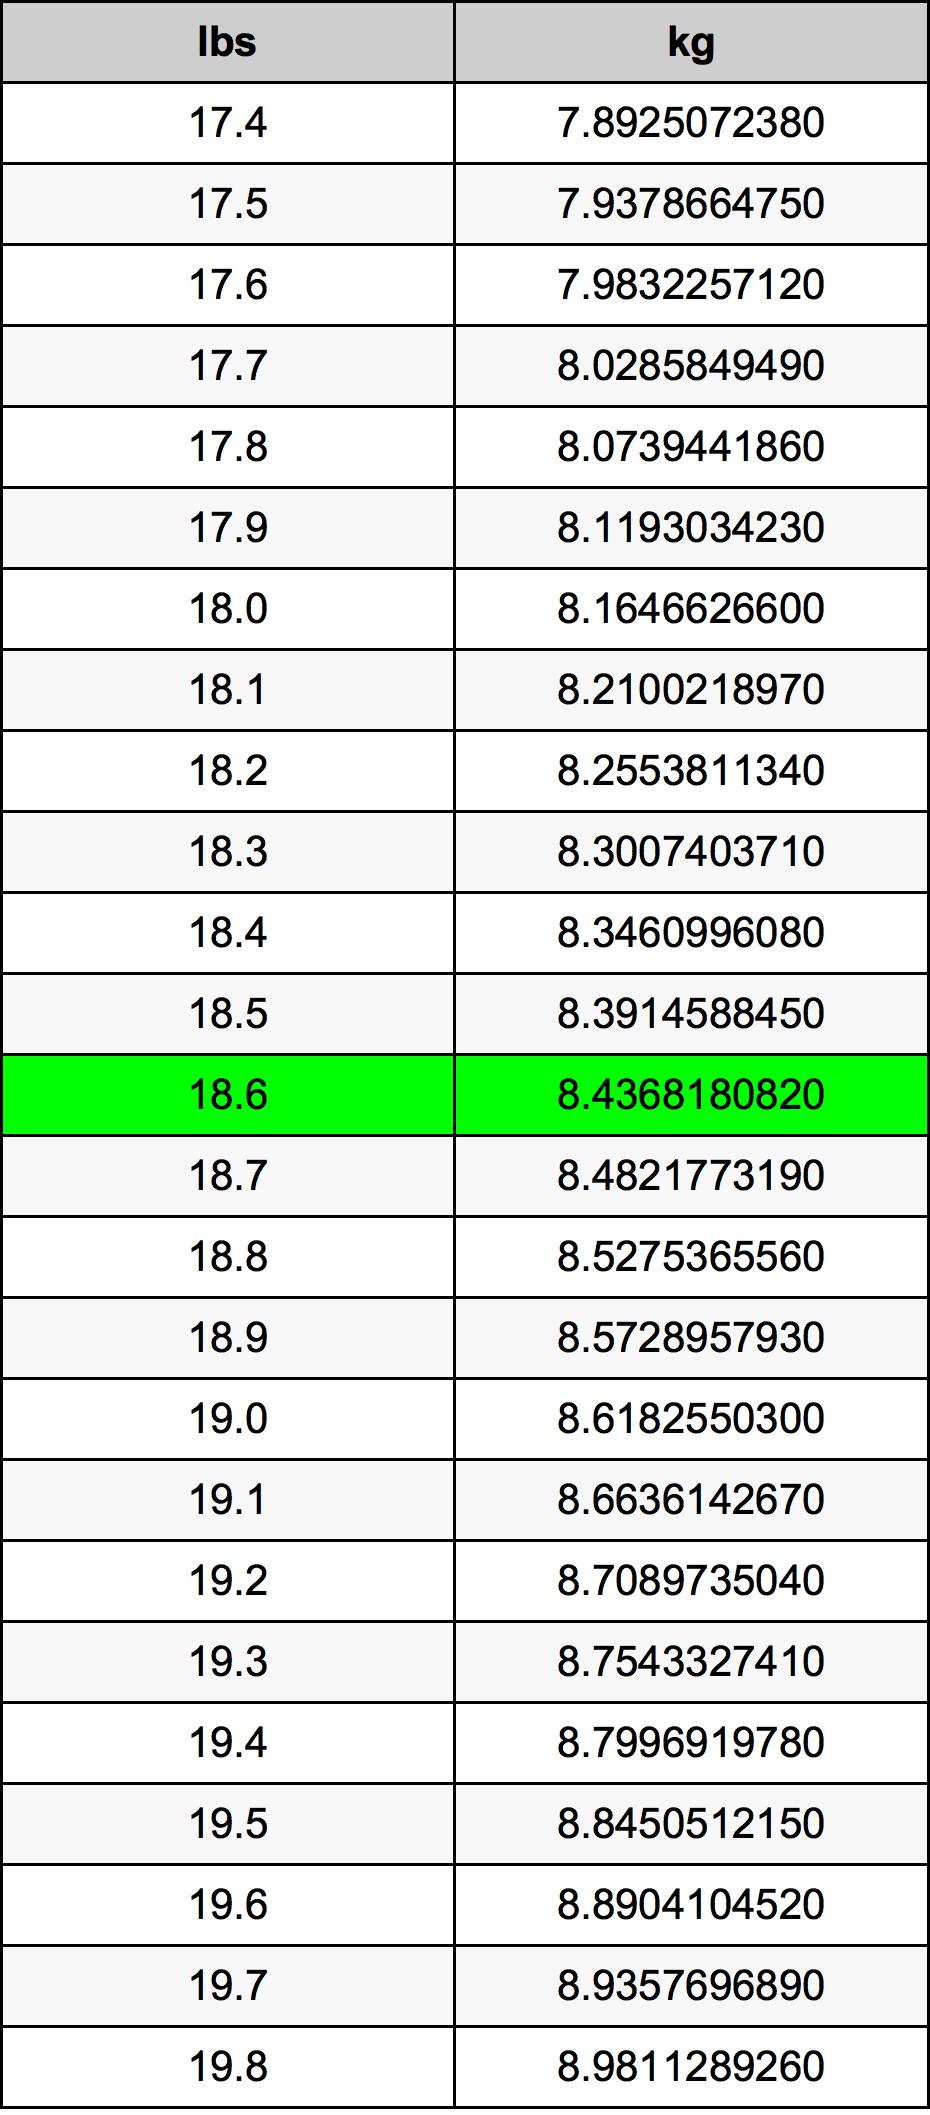 18.6 Libra konverteringstabellen